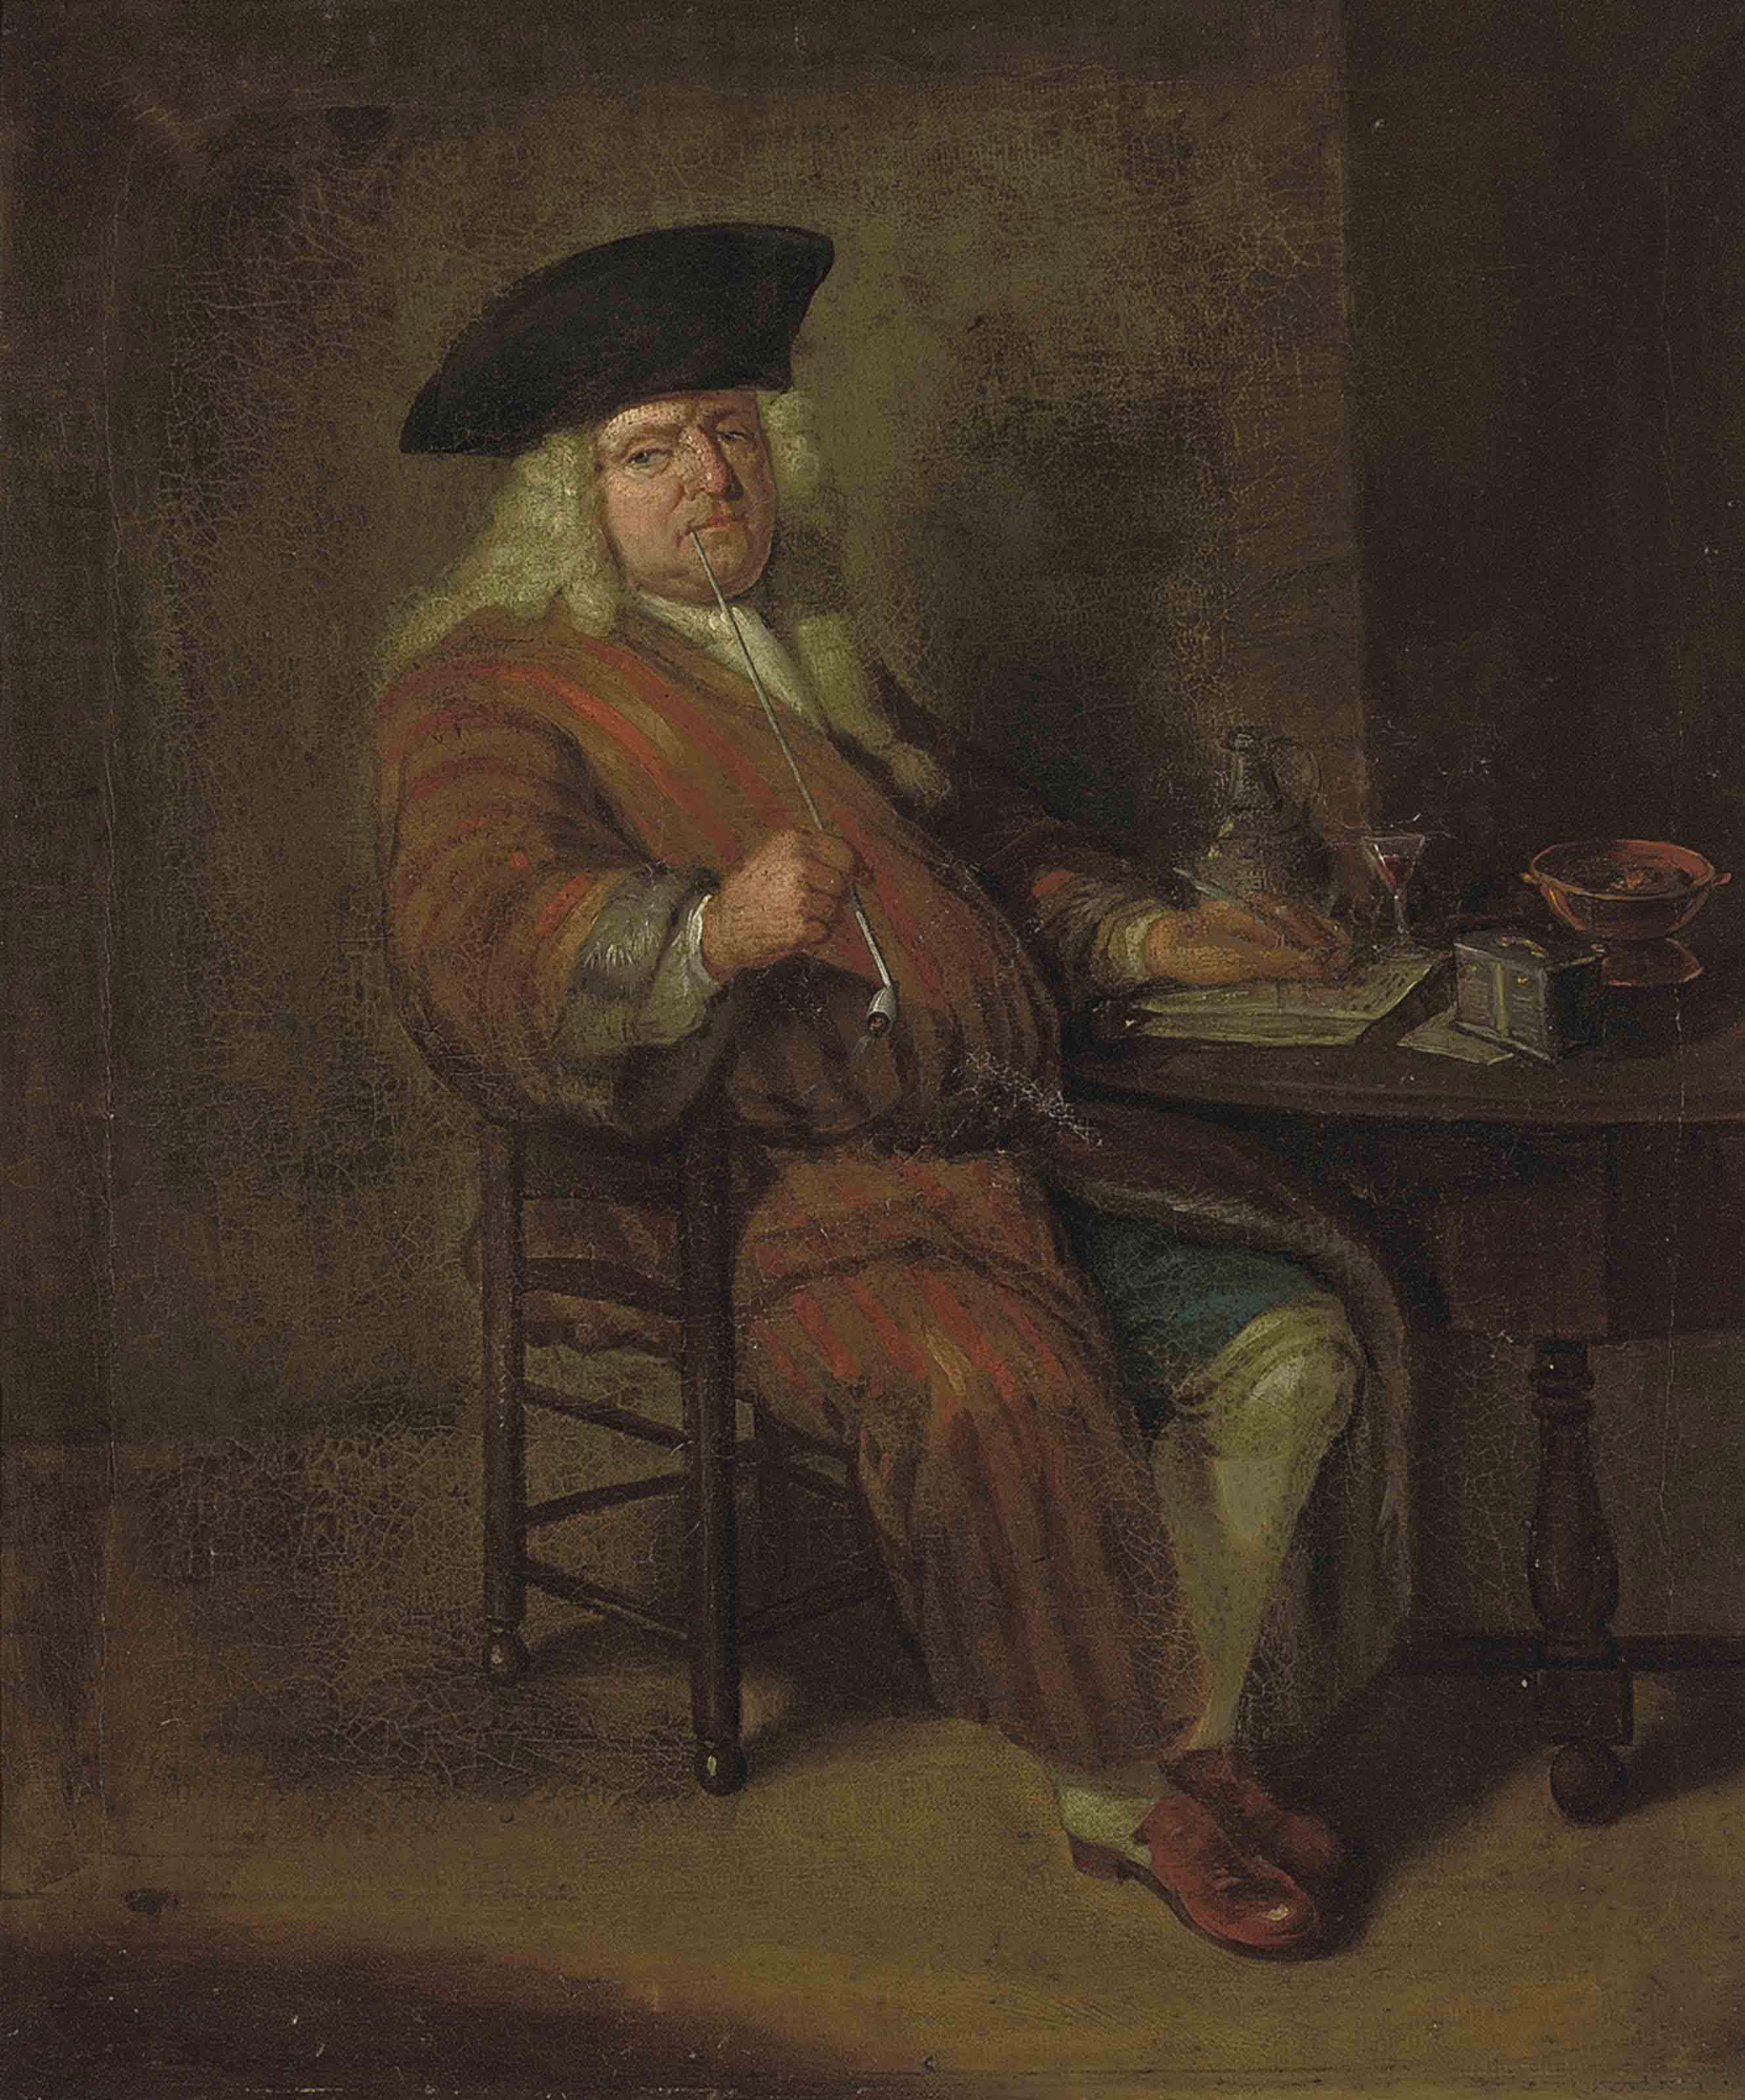 Anglo-Dutch School, 18th Century